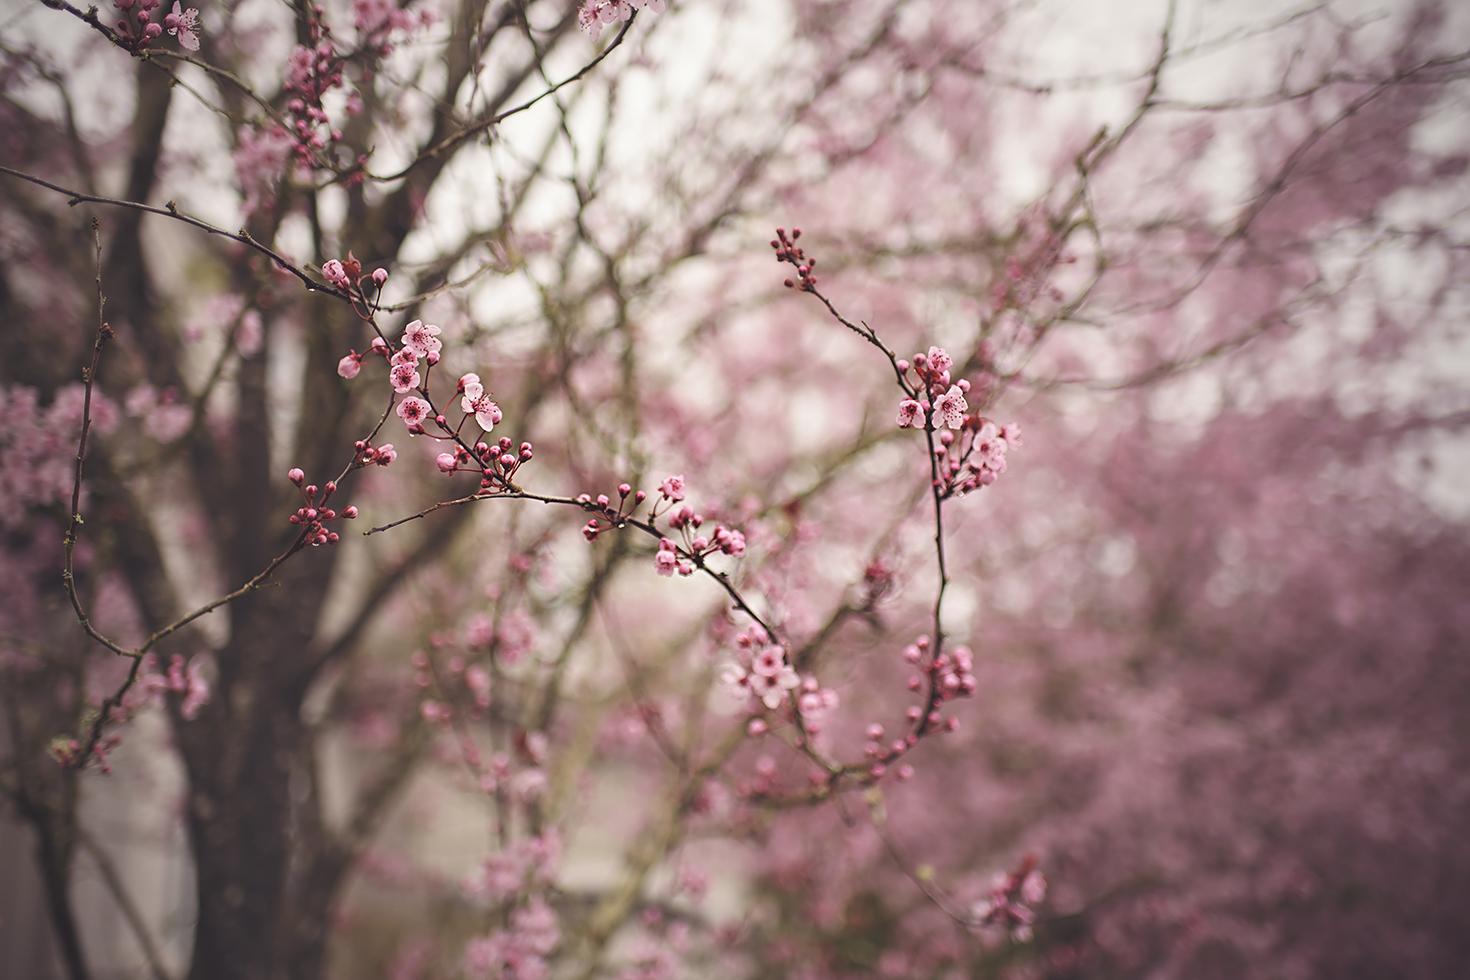 2017-04-05 - Cherry Blossoms 1